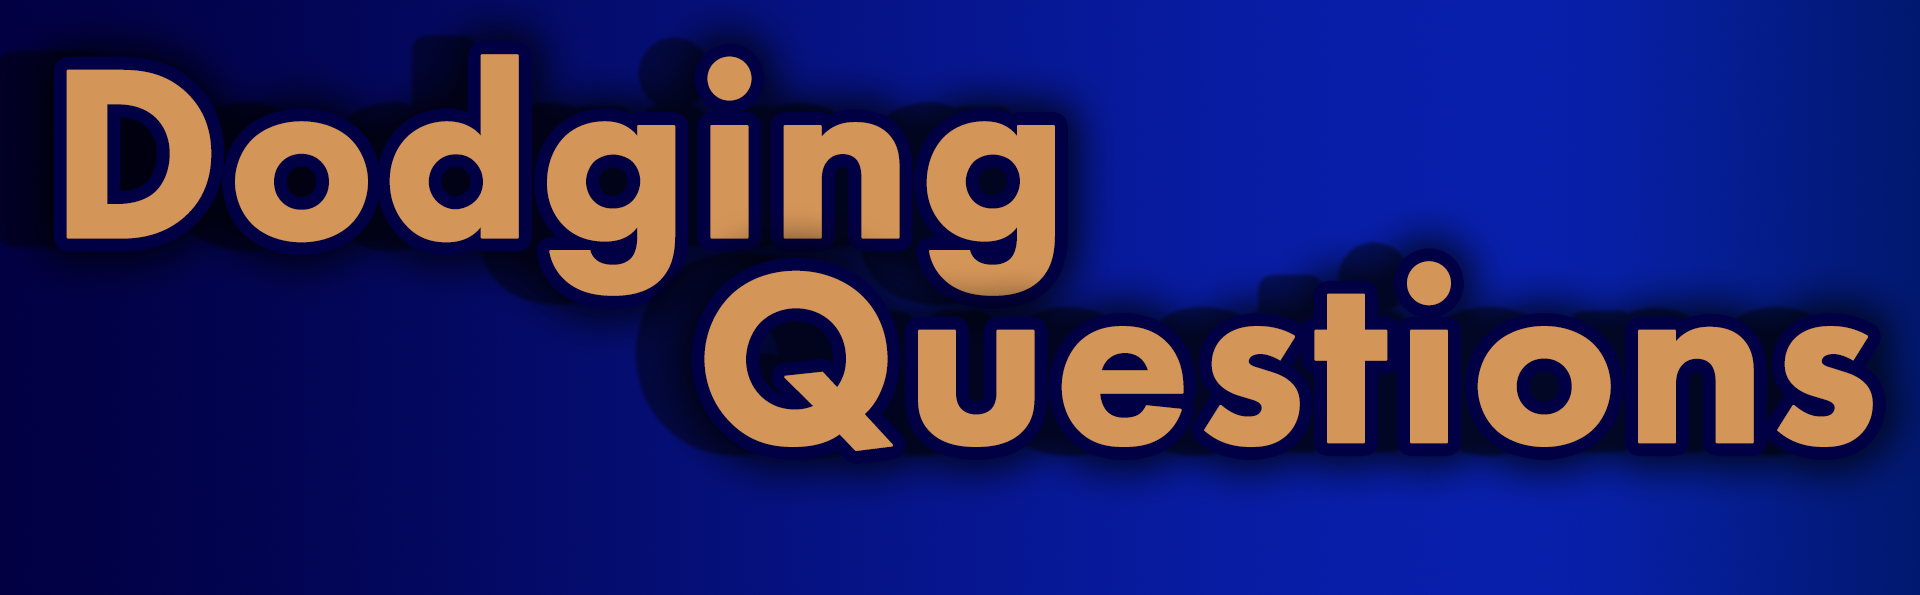 Dodging Questions (Prototype)